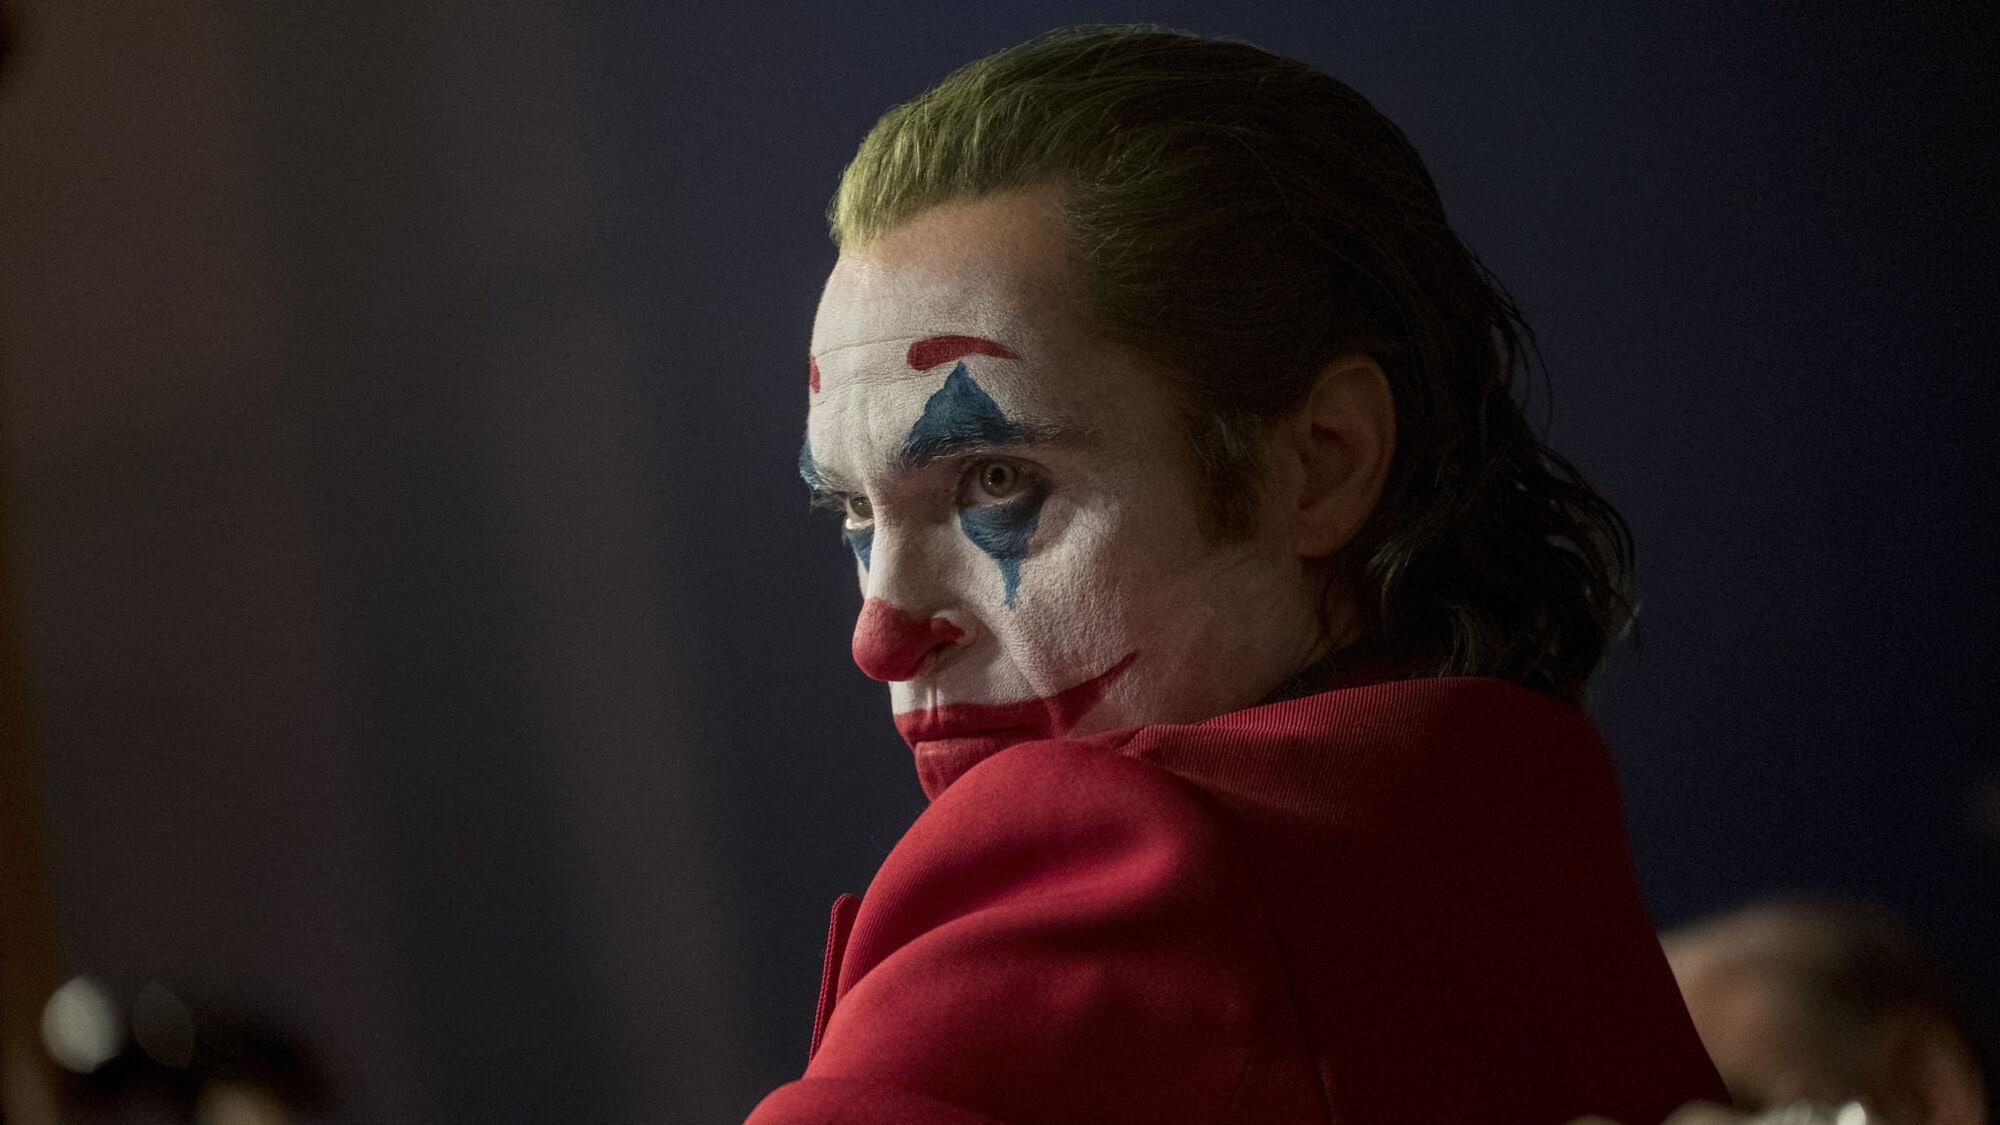 joaquin phoenix új joker film joker maszk mozi